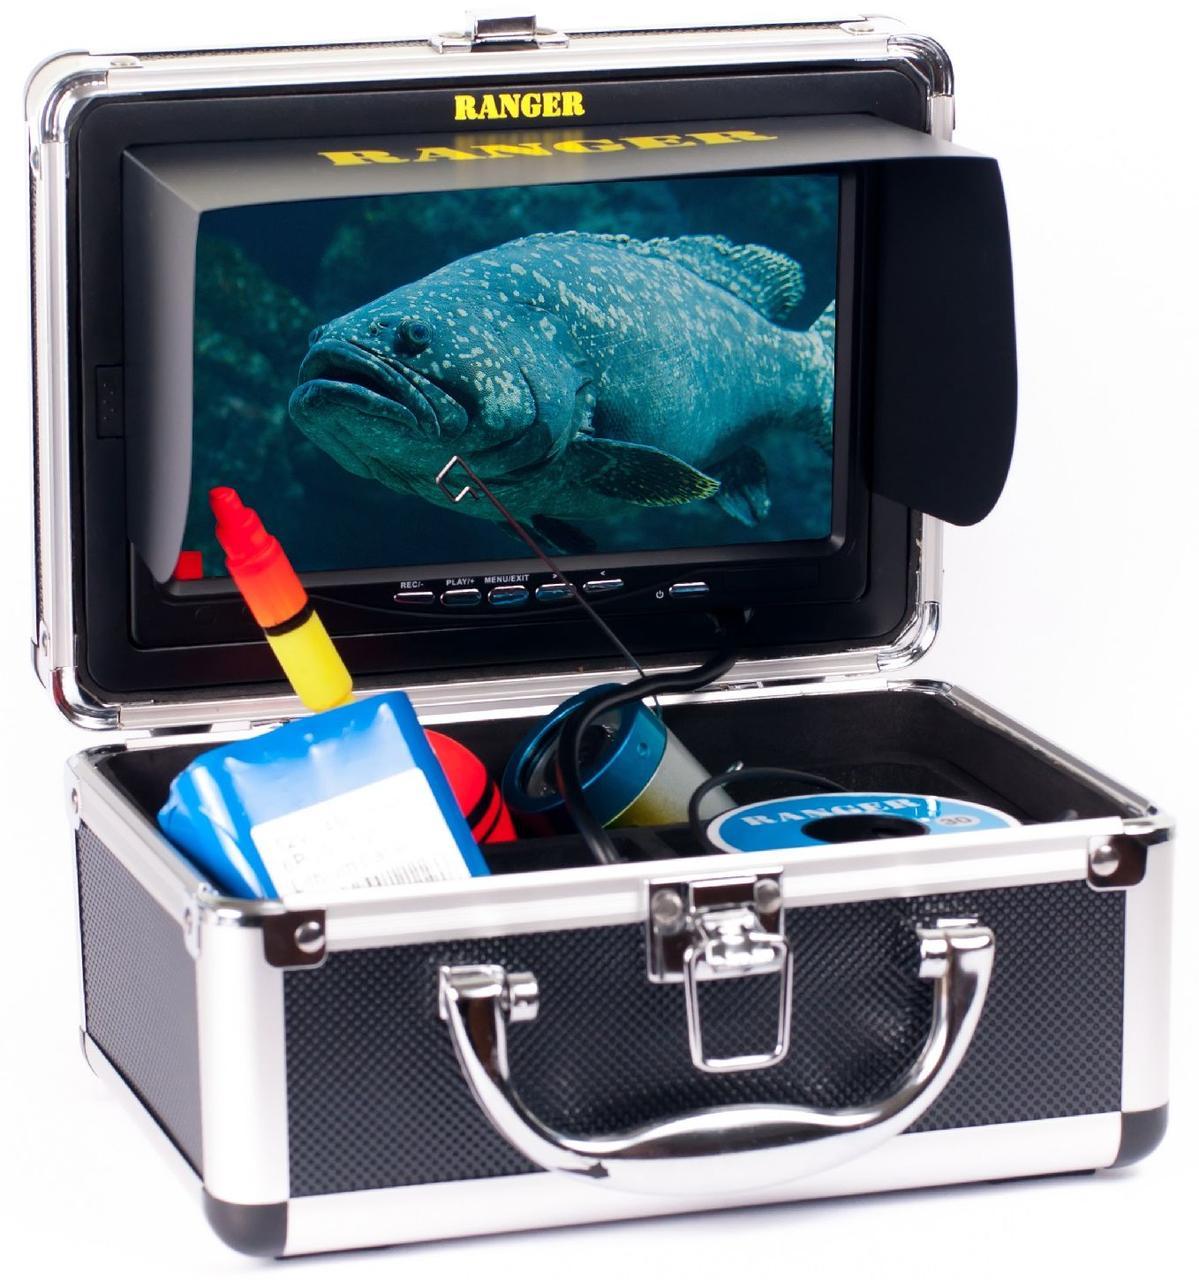 "Подводная камера для рыбалки Ranger Lux Record (экран 7"") + карта памяти 8 Гб (підводна камера для риболовлі)"